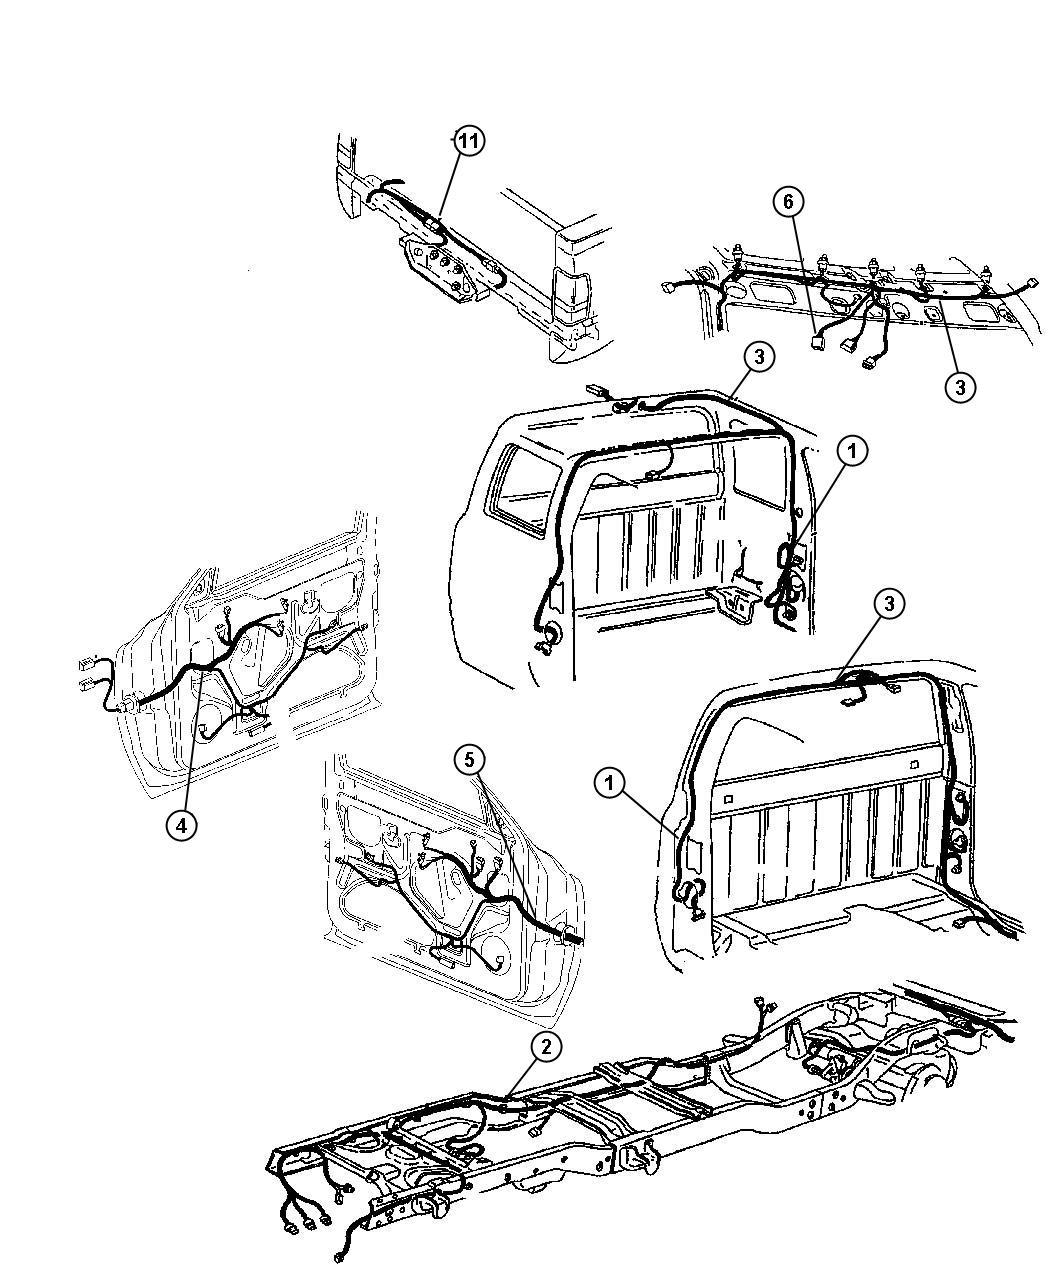 Dodge Ram 1500 Wiring. Left, power. Seat. Power seat, seat